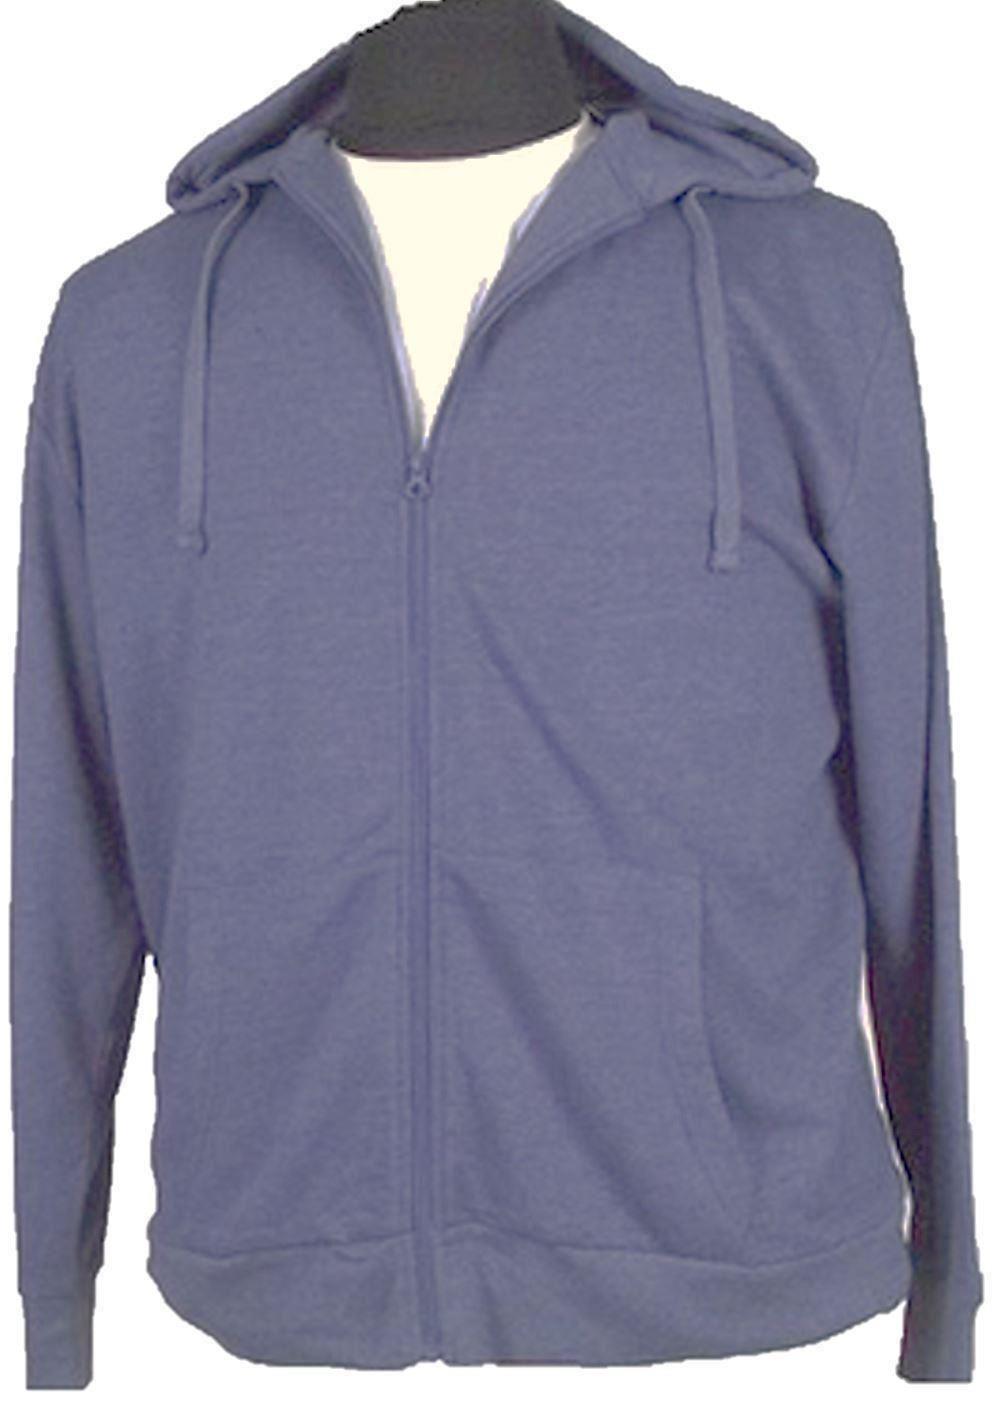 4xl hoodies